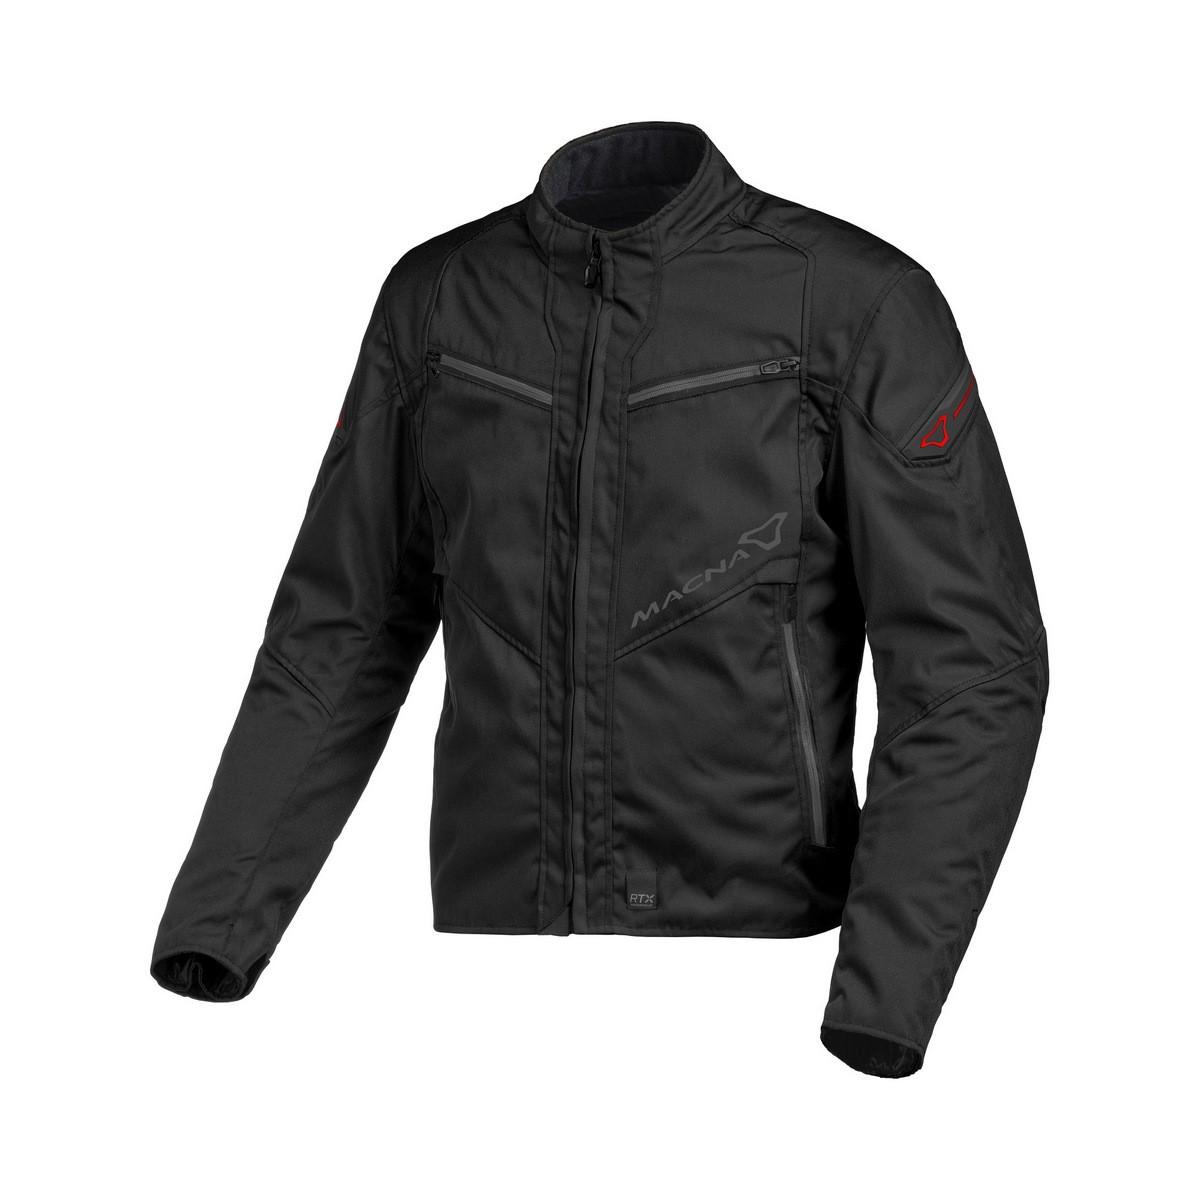 Textile jacket Macna Solute (Black)